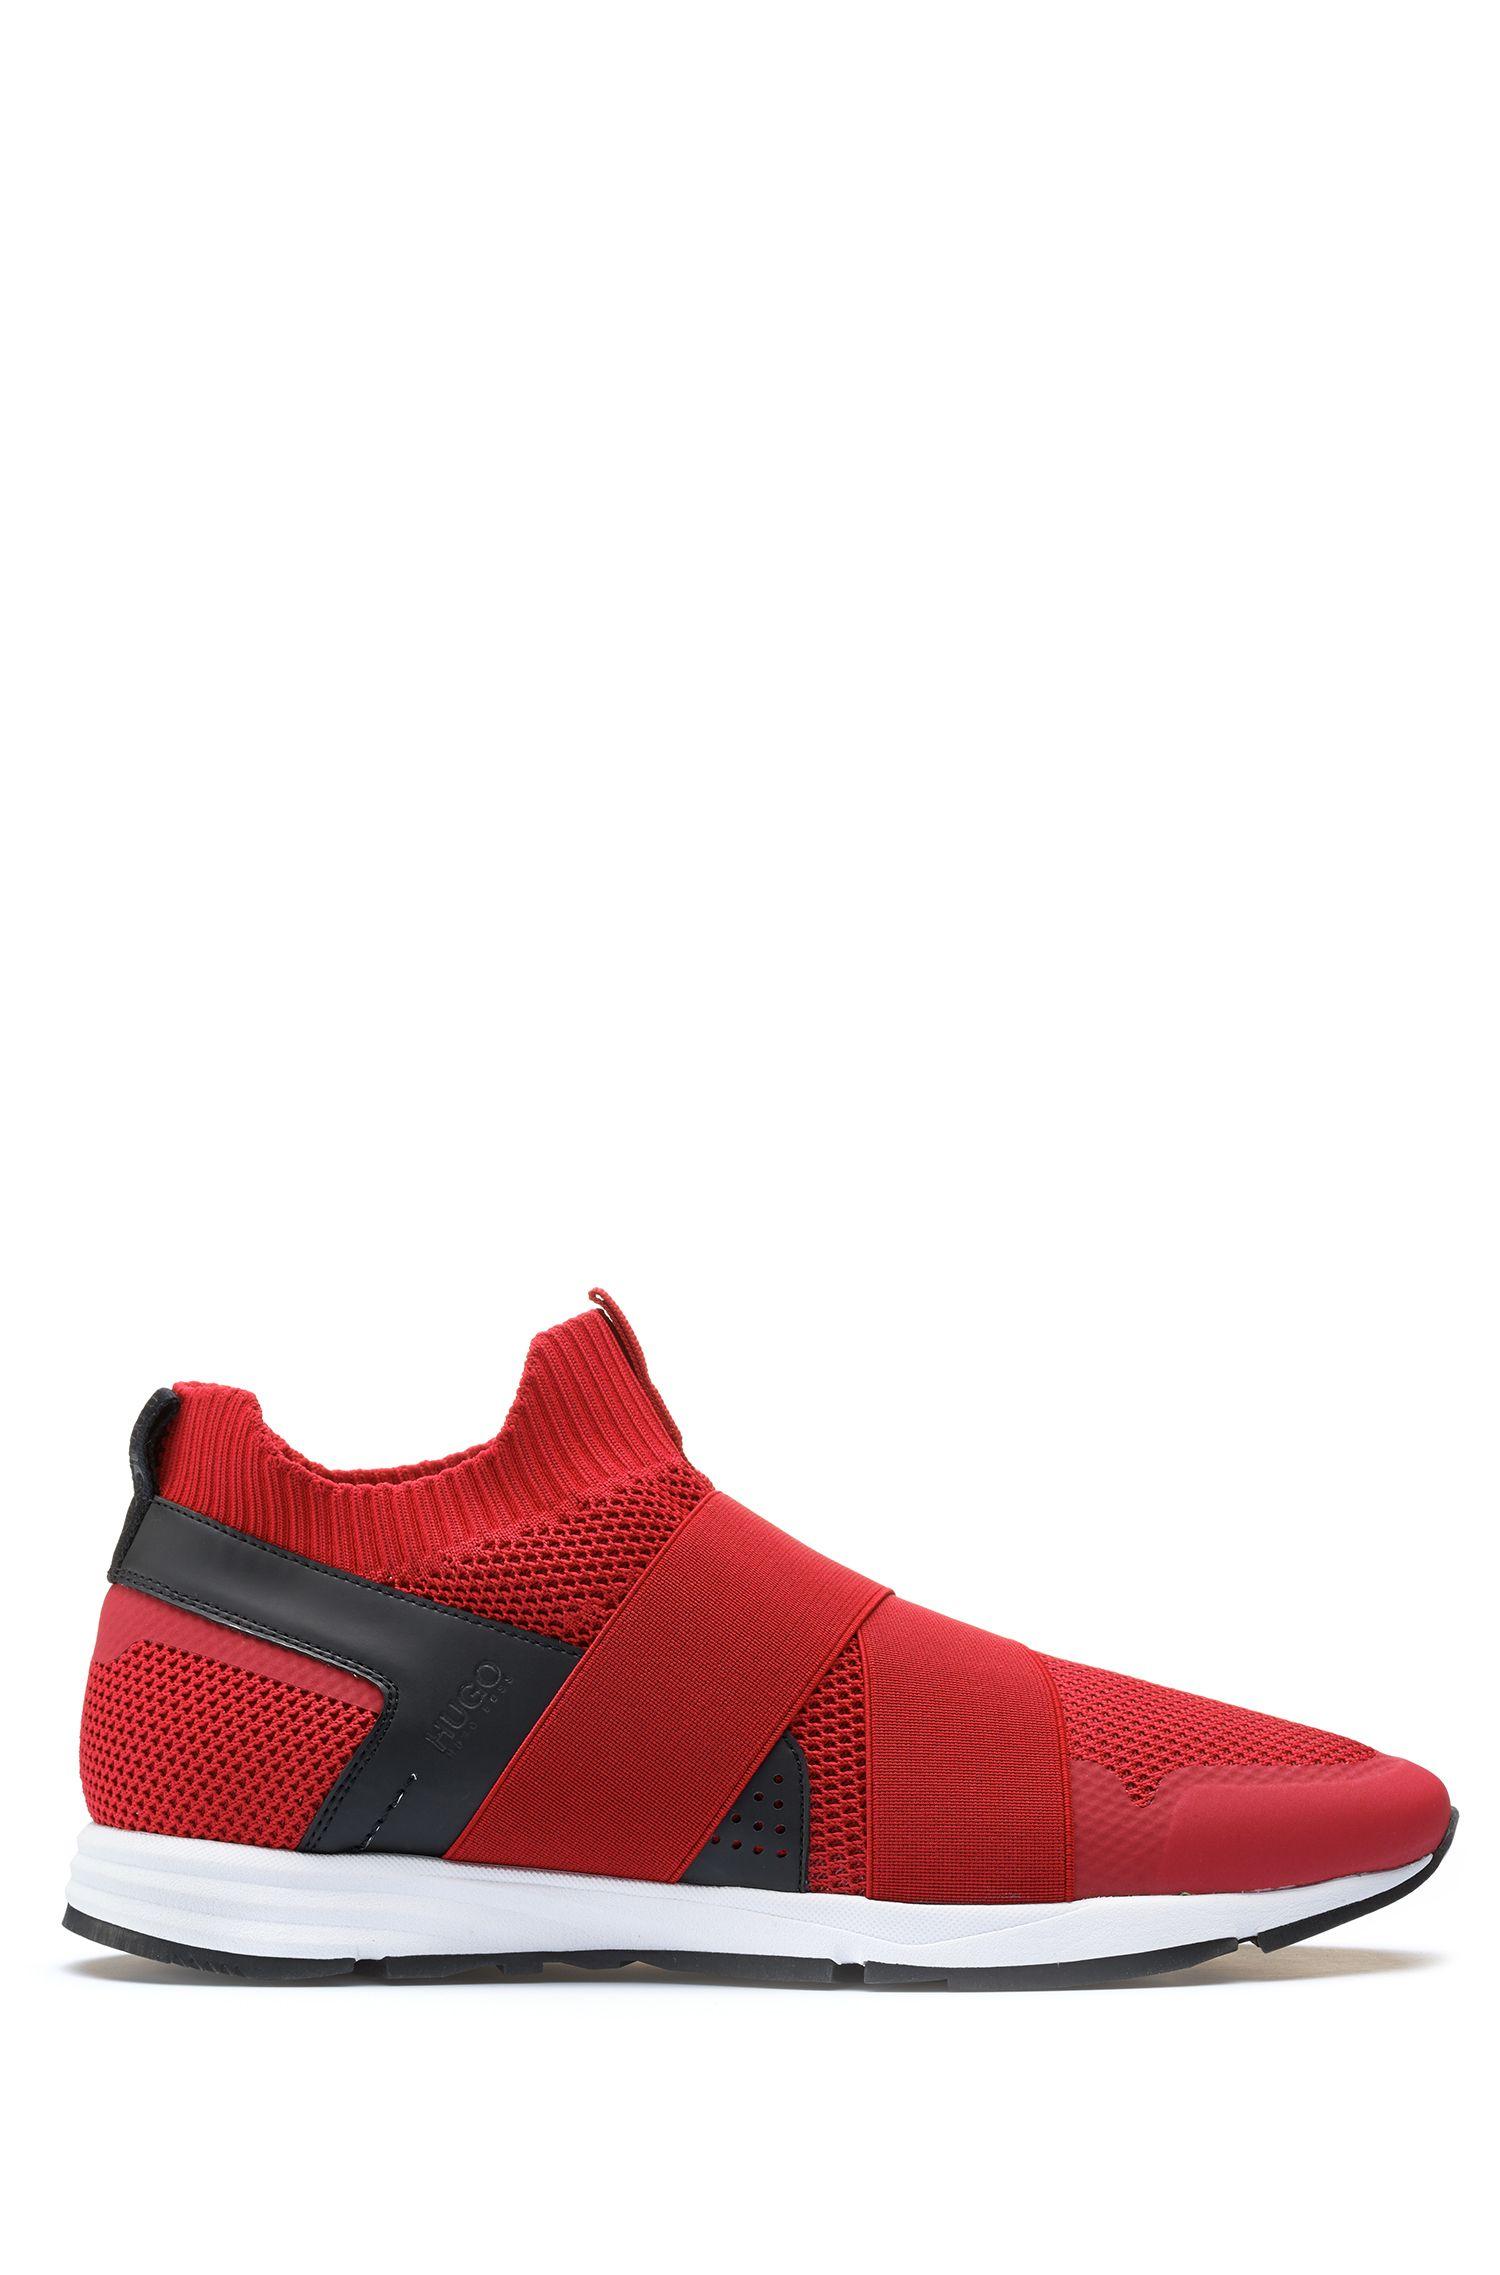 Slip-on hybrid sneakers with Vibram sole, Dark Red